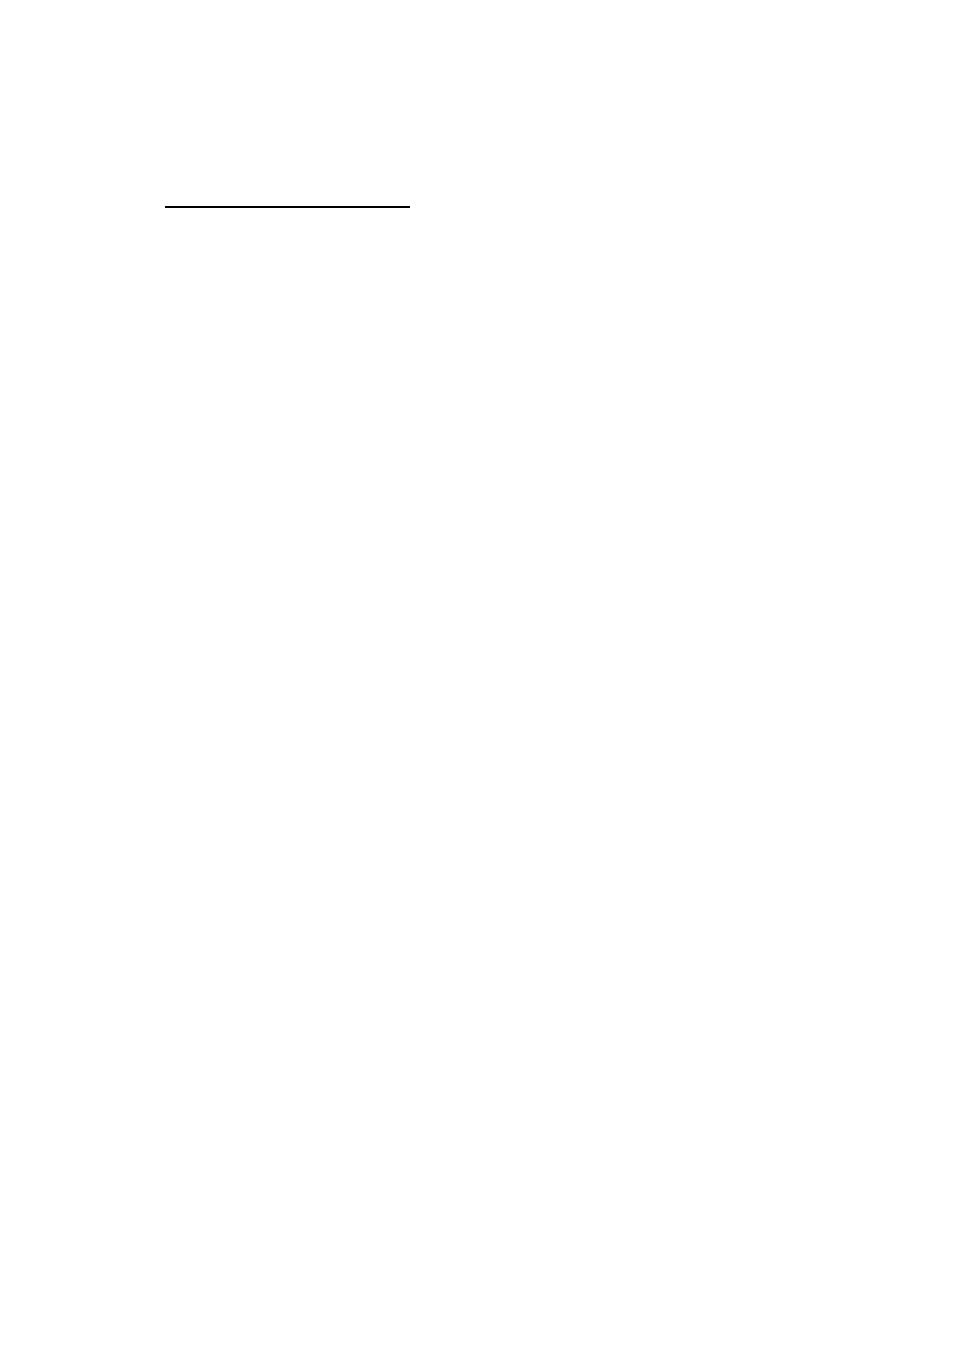 Razer Chimaera 5.1 инструкция